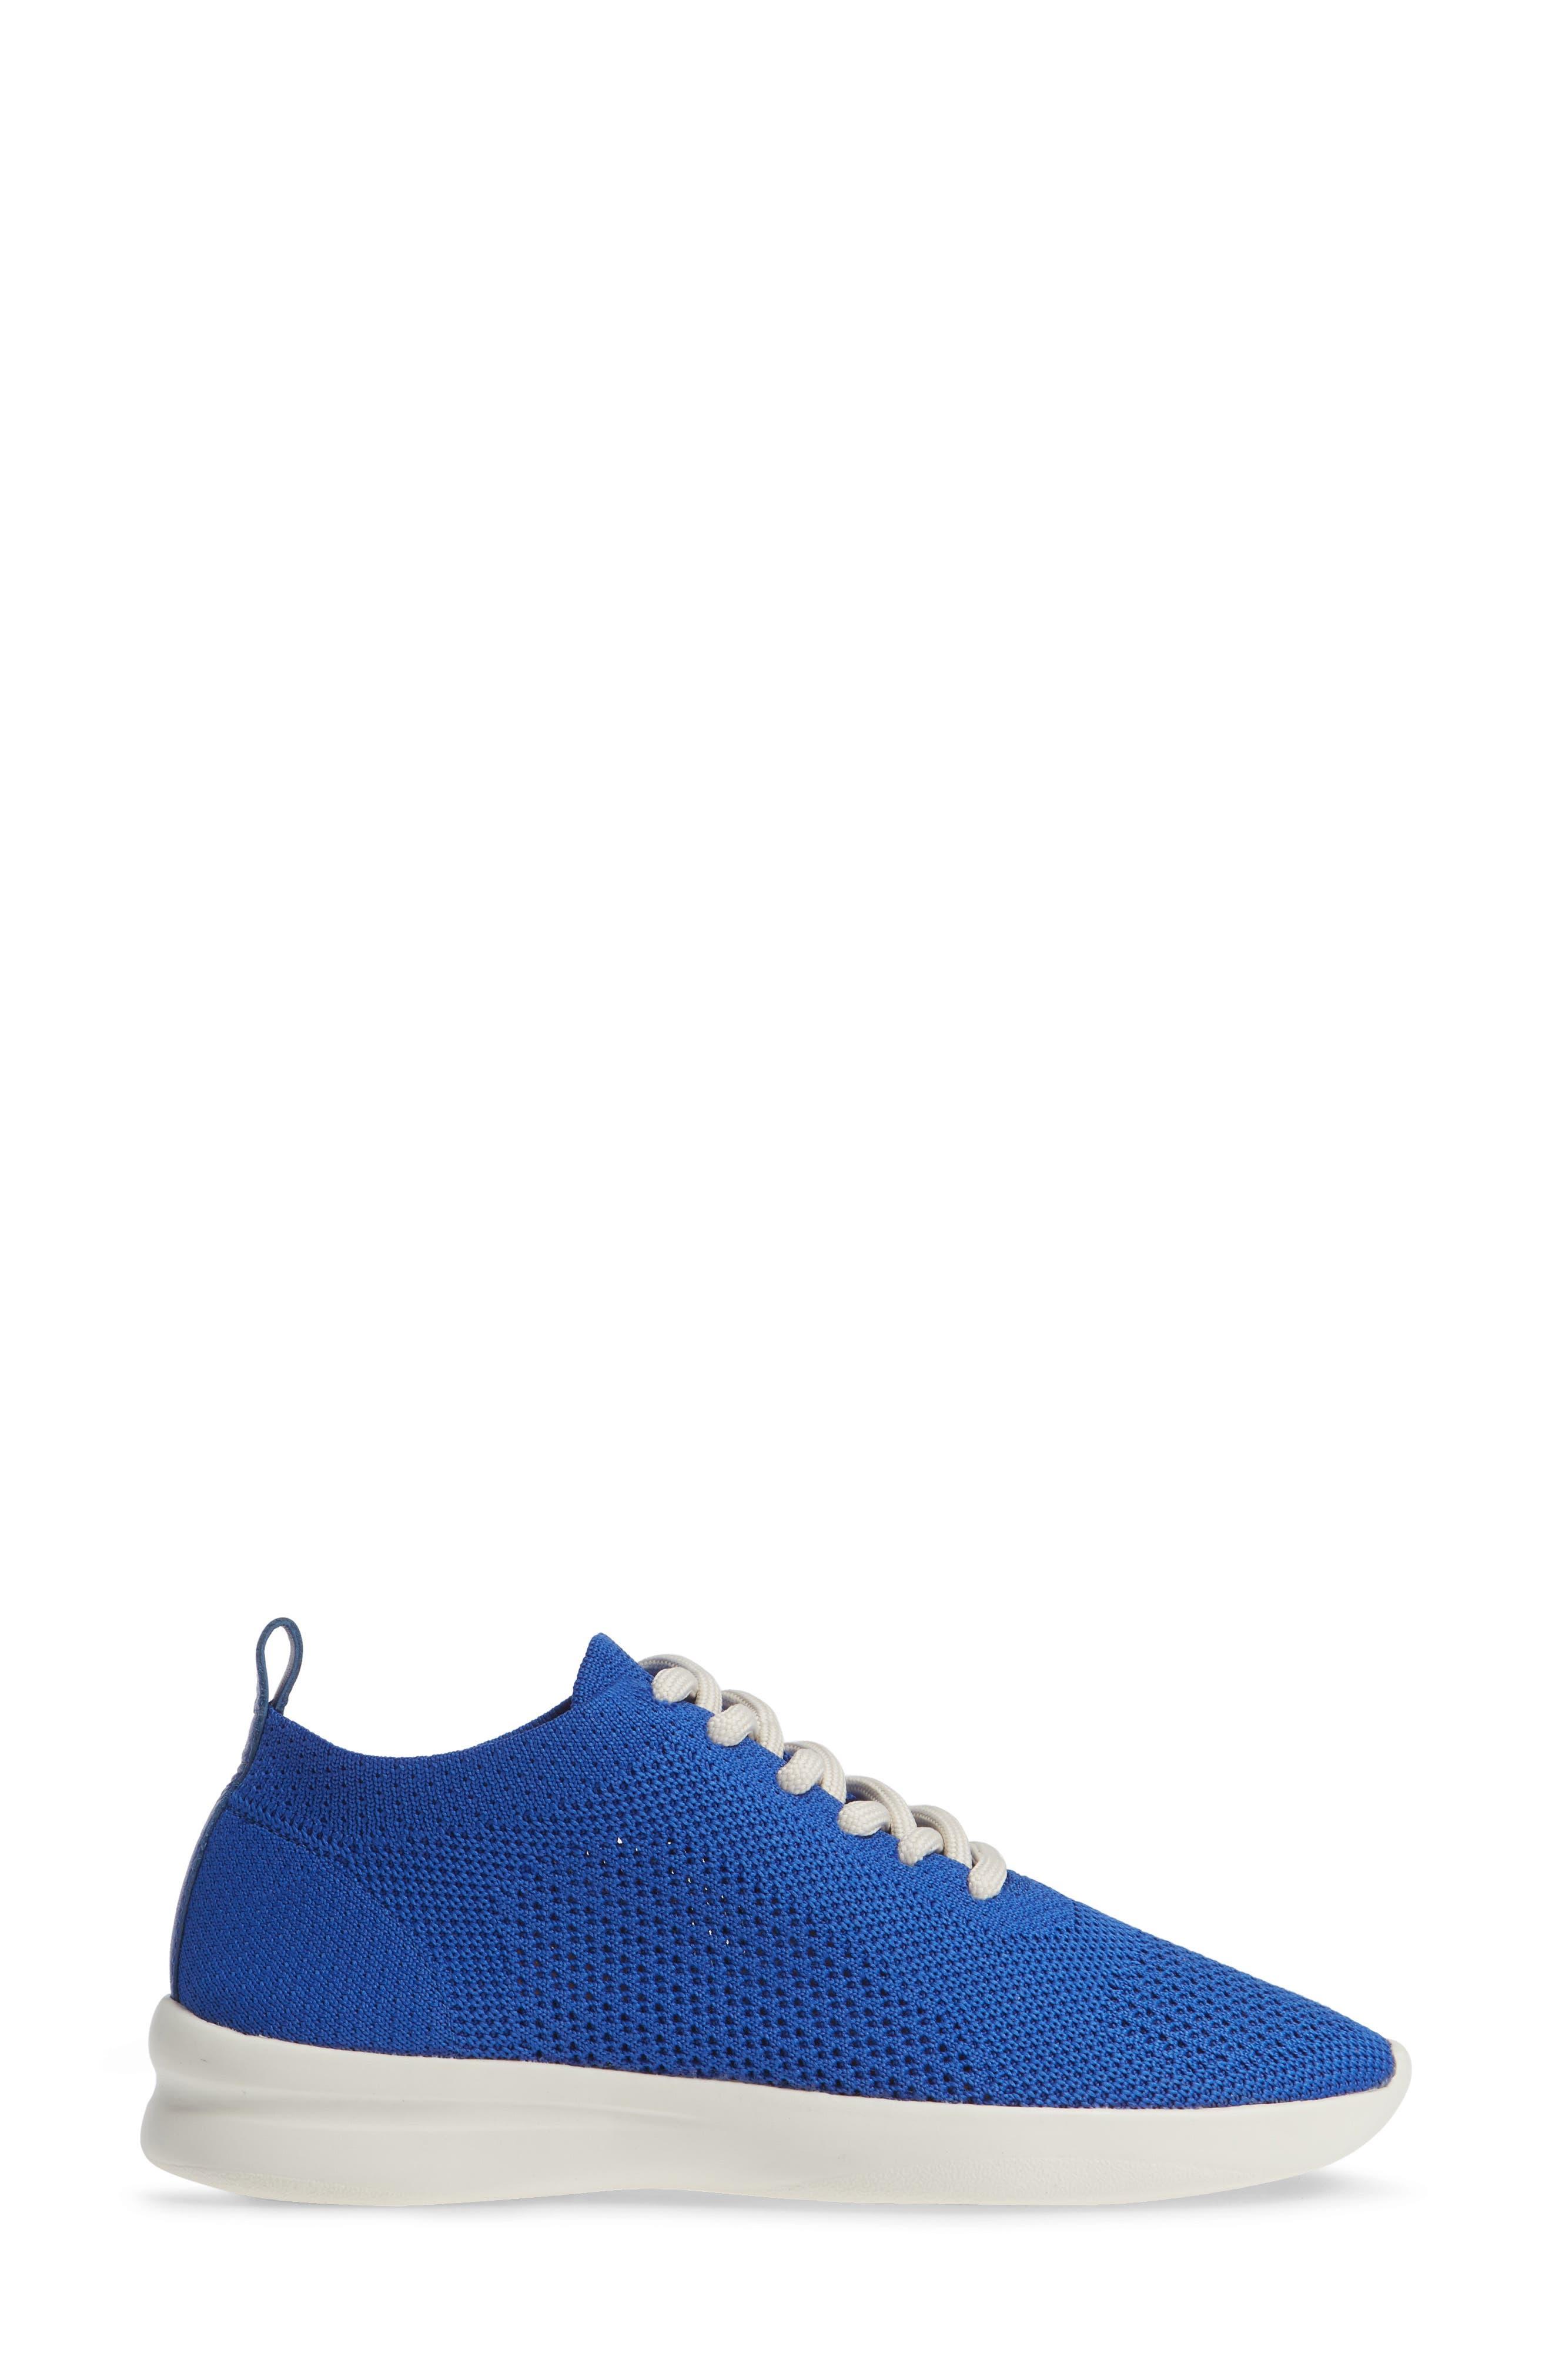 Randee Sneaker,                             Alternate thumbnail 4, color,                             Blue Fabric